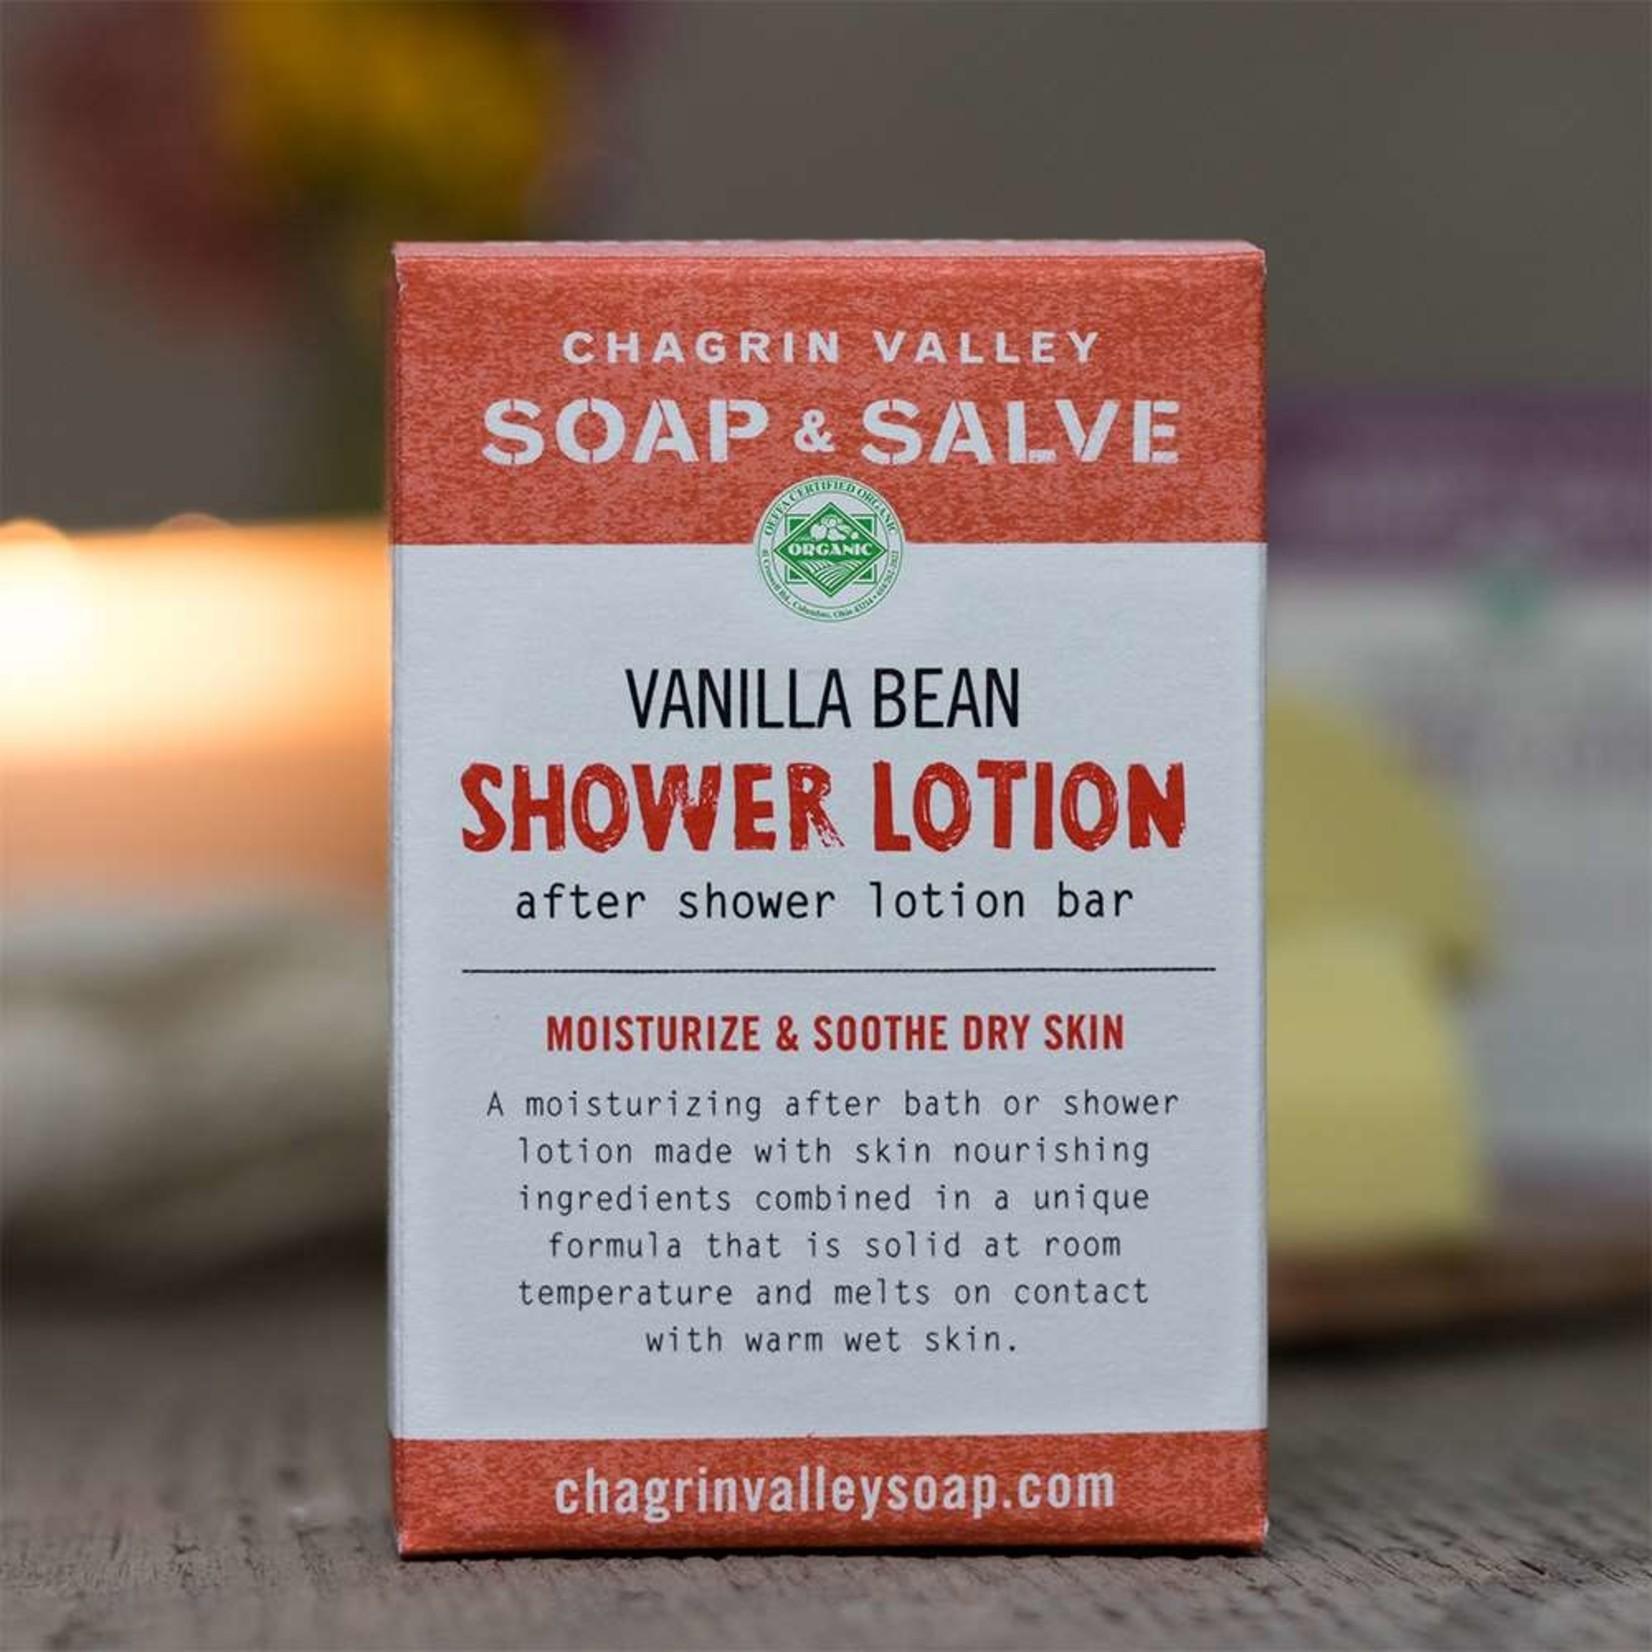 Chagrin Valley Soap and Salve Vanilla Bean Shower Lotion 3.5oz Bar